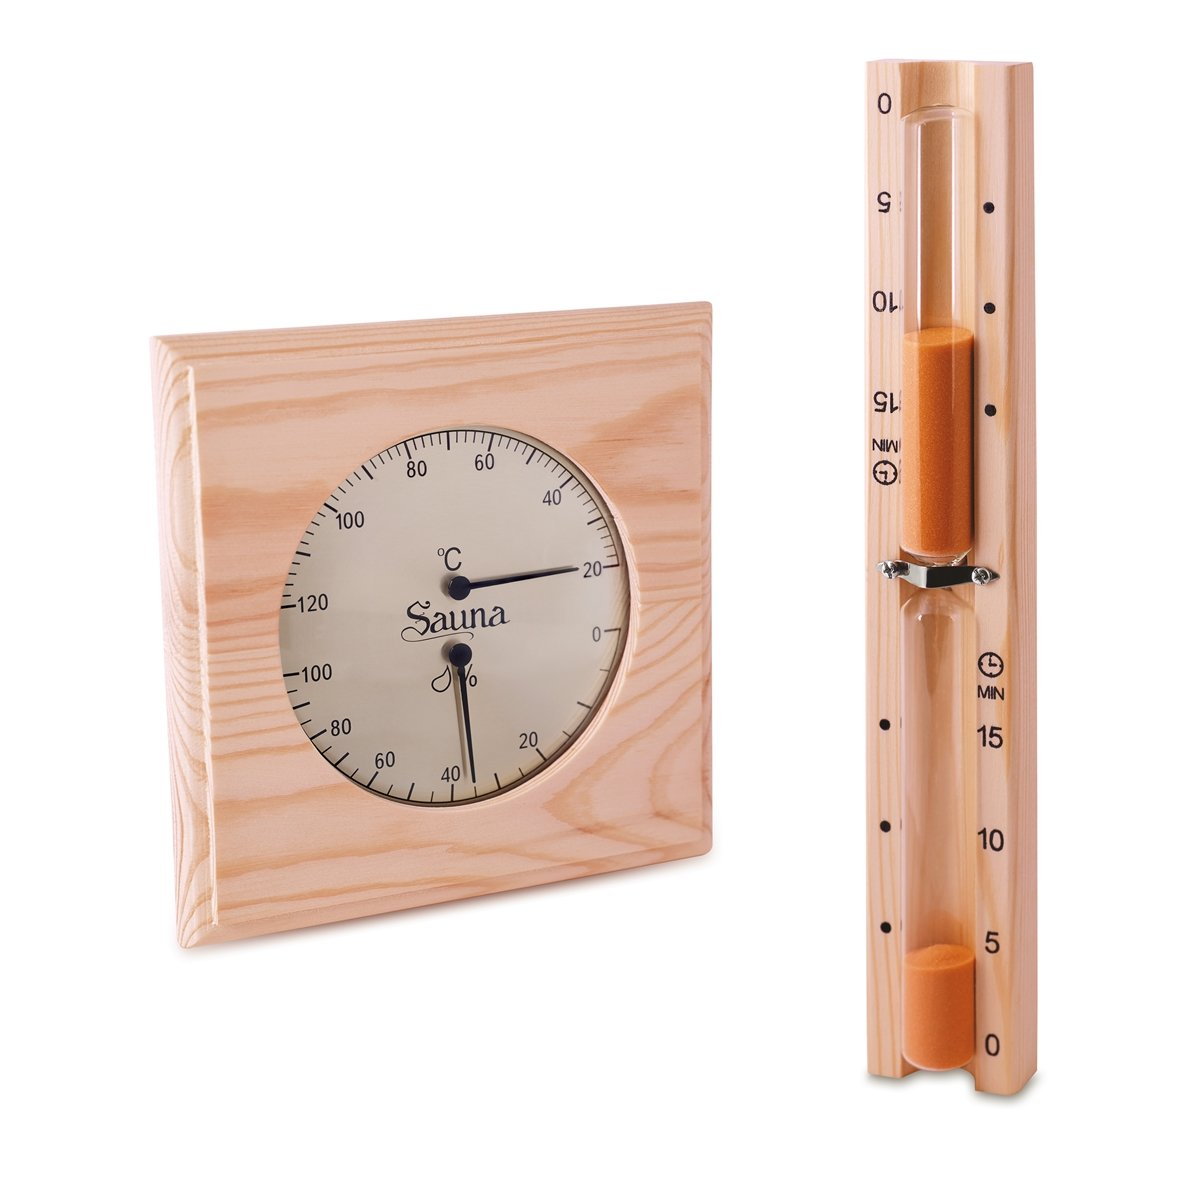 Sauna Set - Hygrometer Thermometer & Sanduhr Basic Klimamesser Meß gerä t Sawo